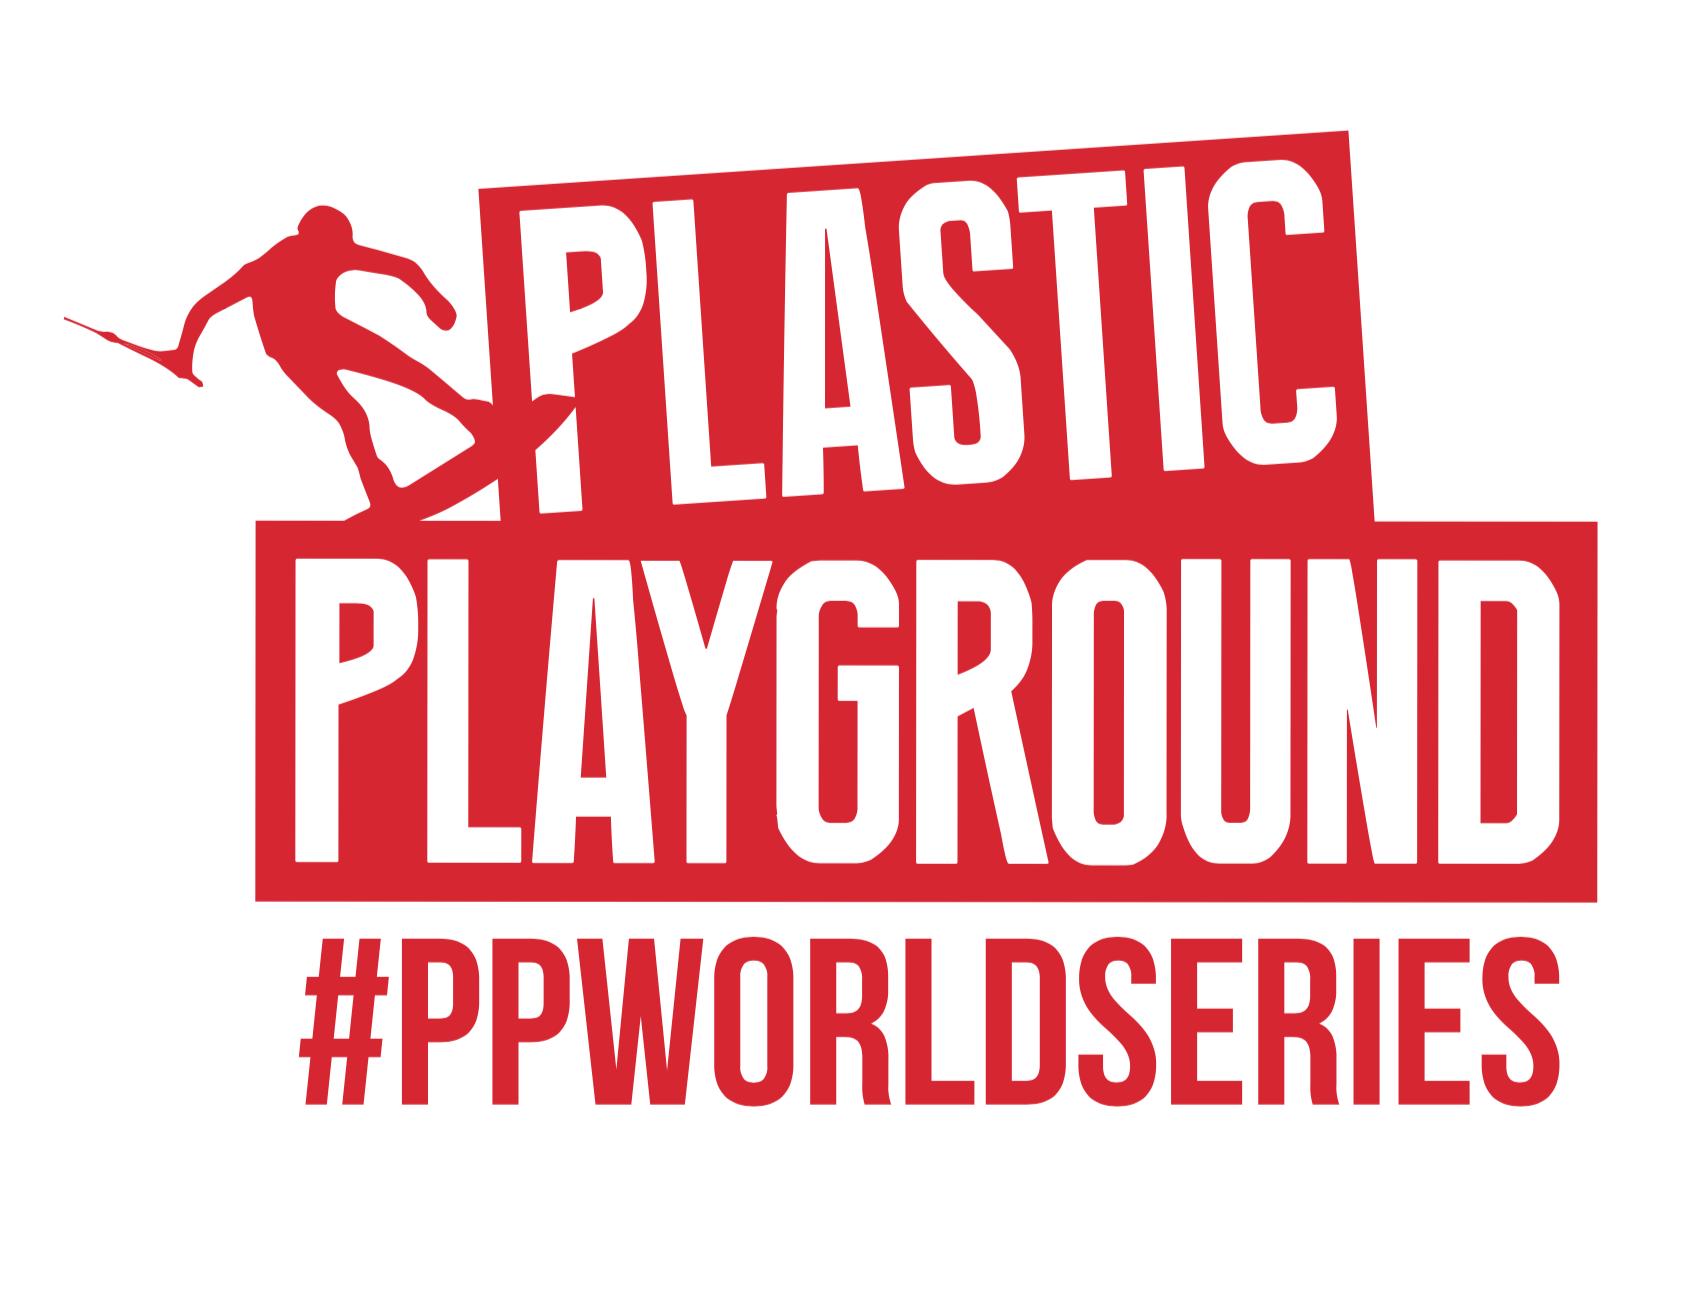 Plastic playground logo